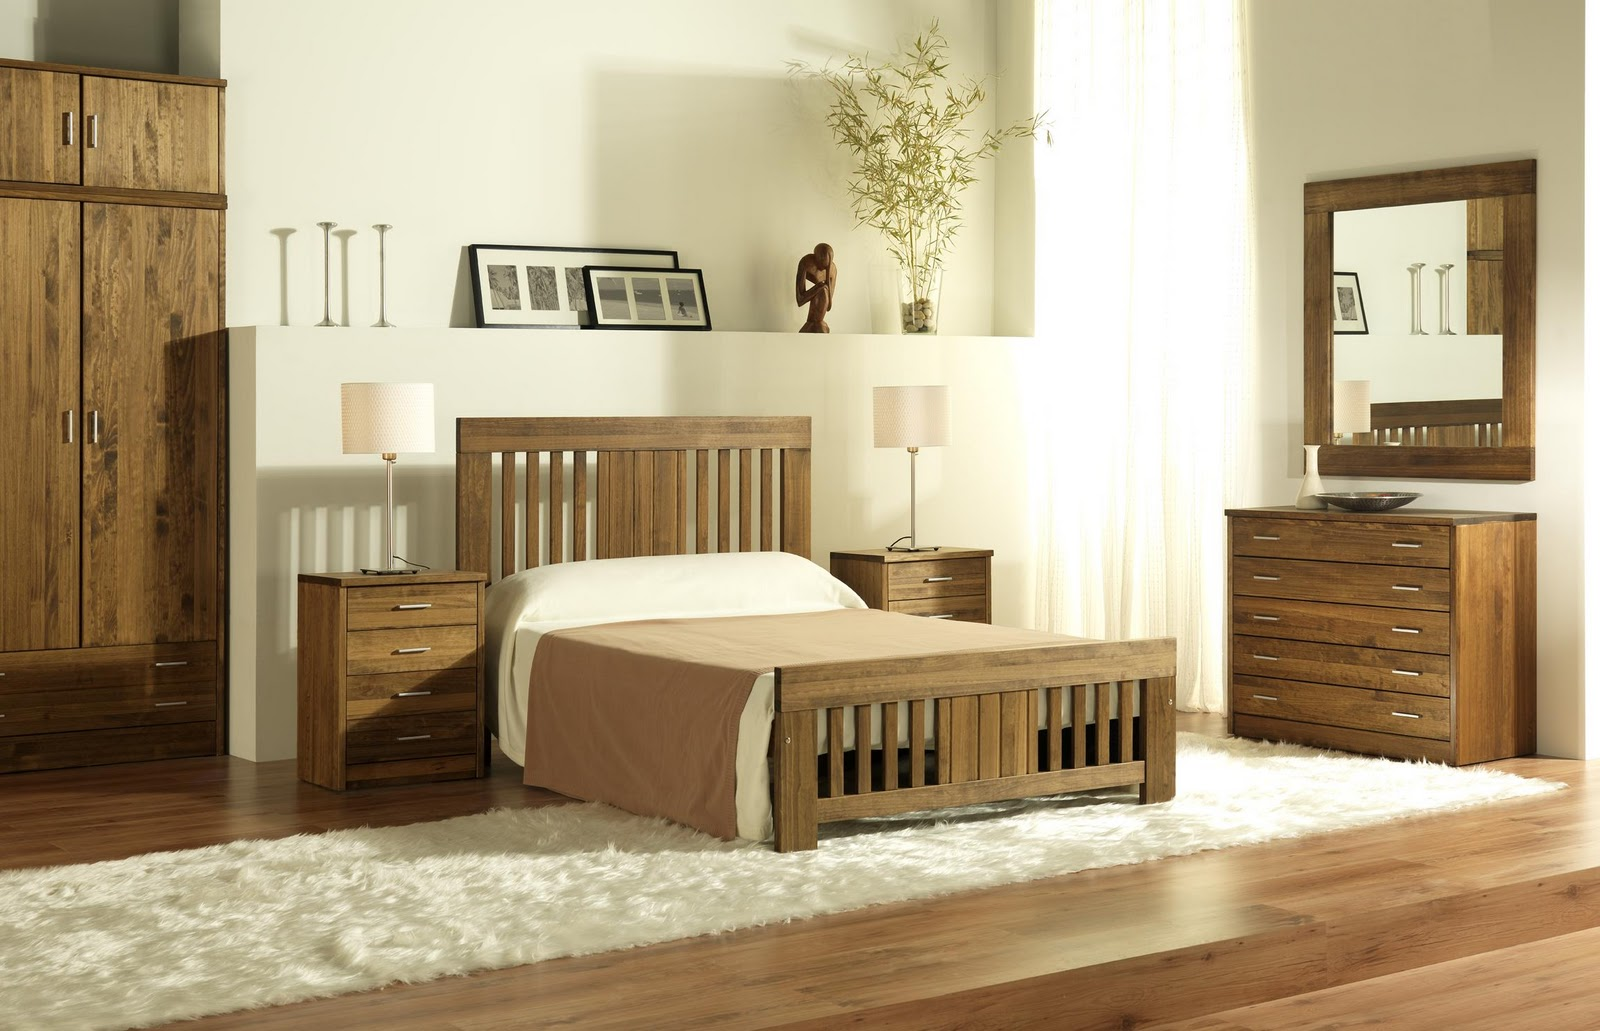 Muebles toscapino pino for Sillas para habitacion matrimonio